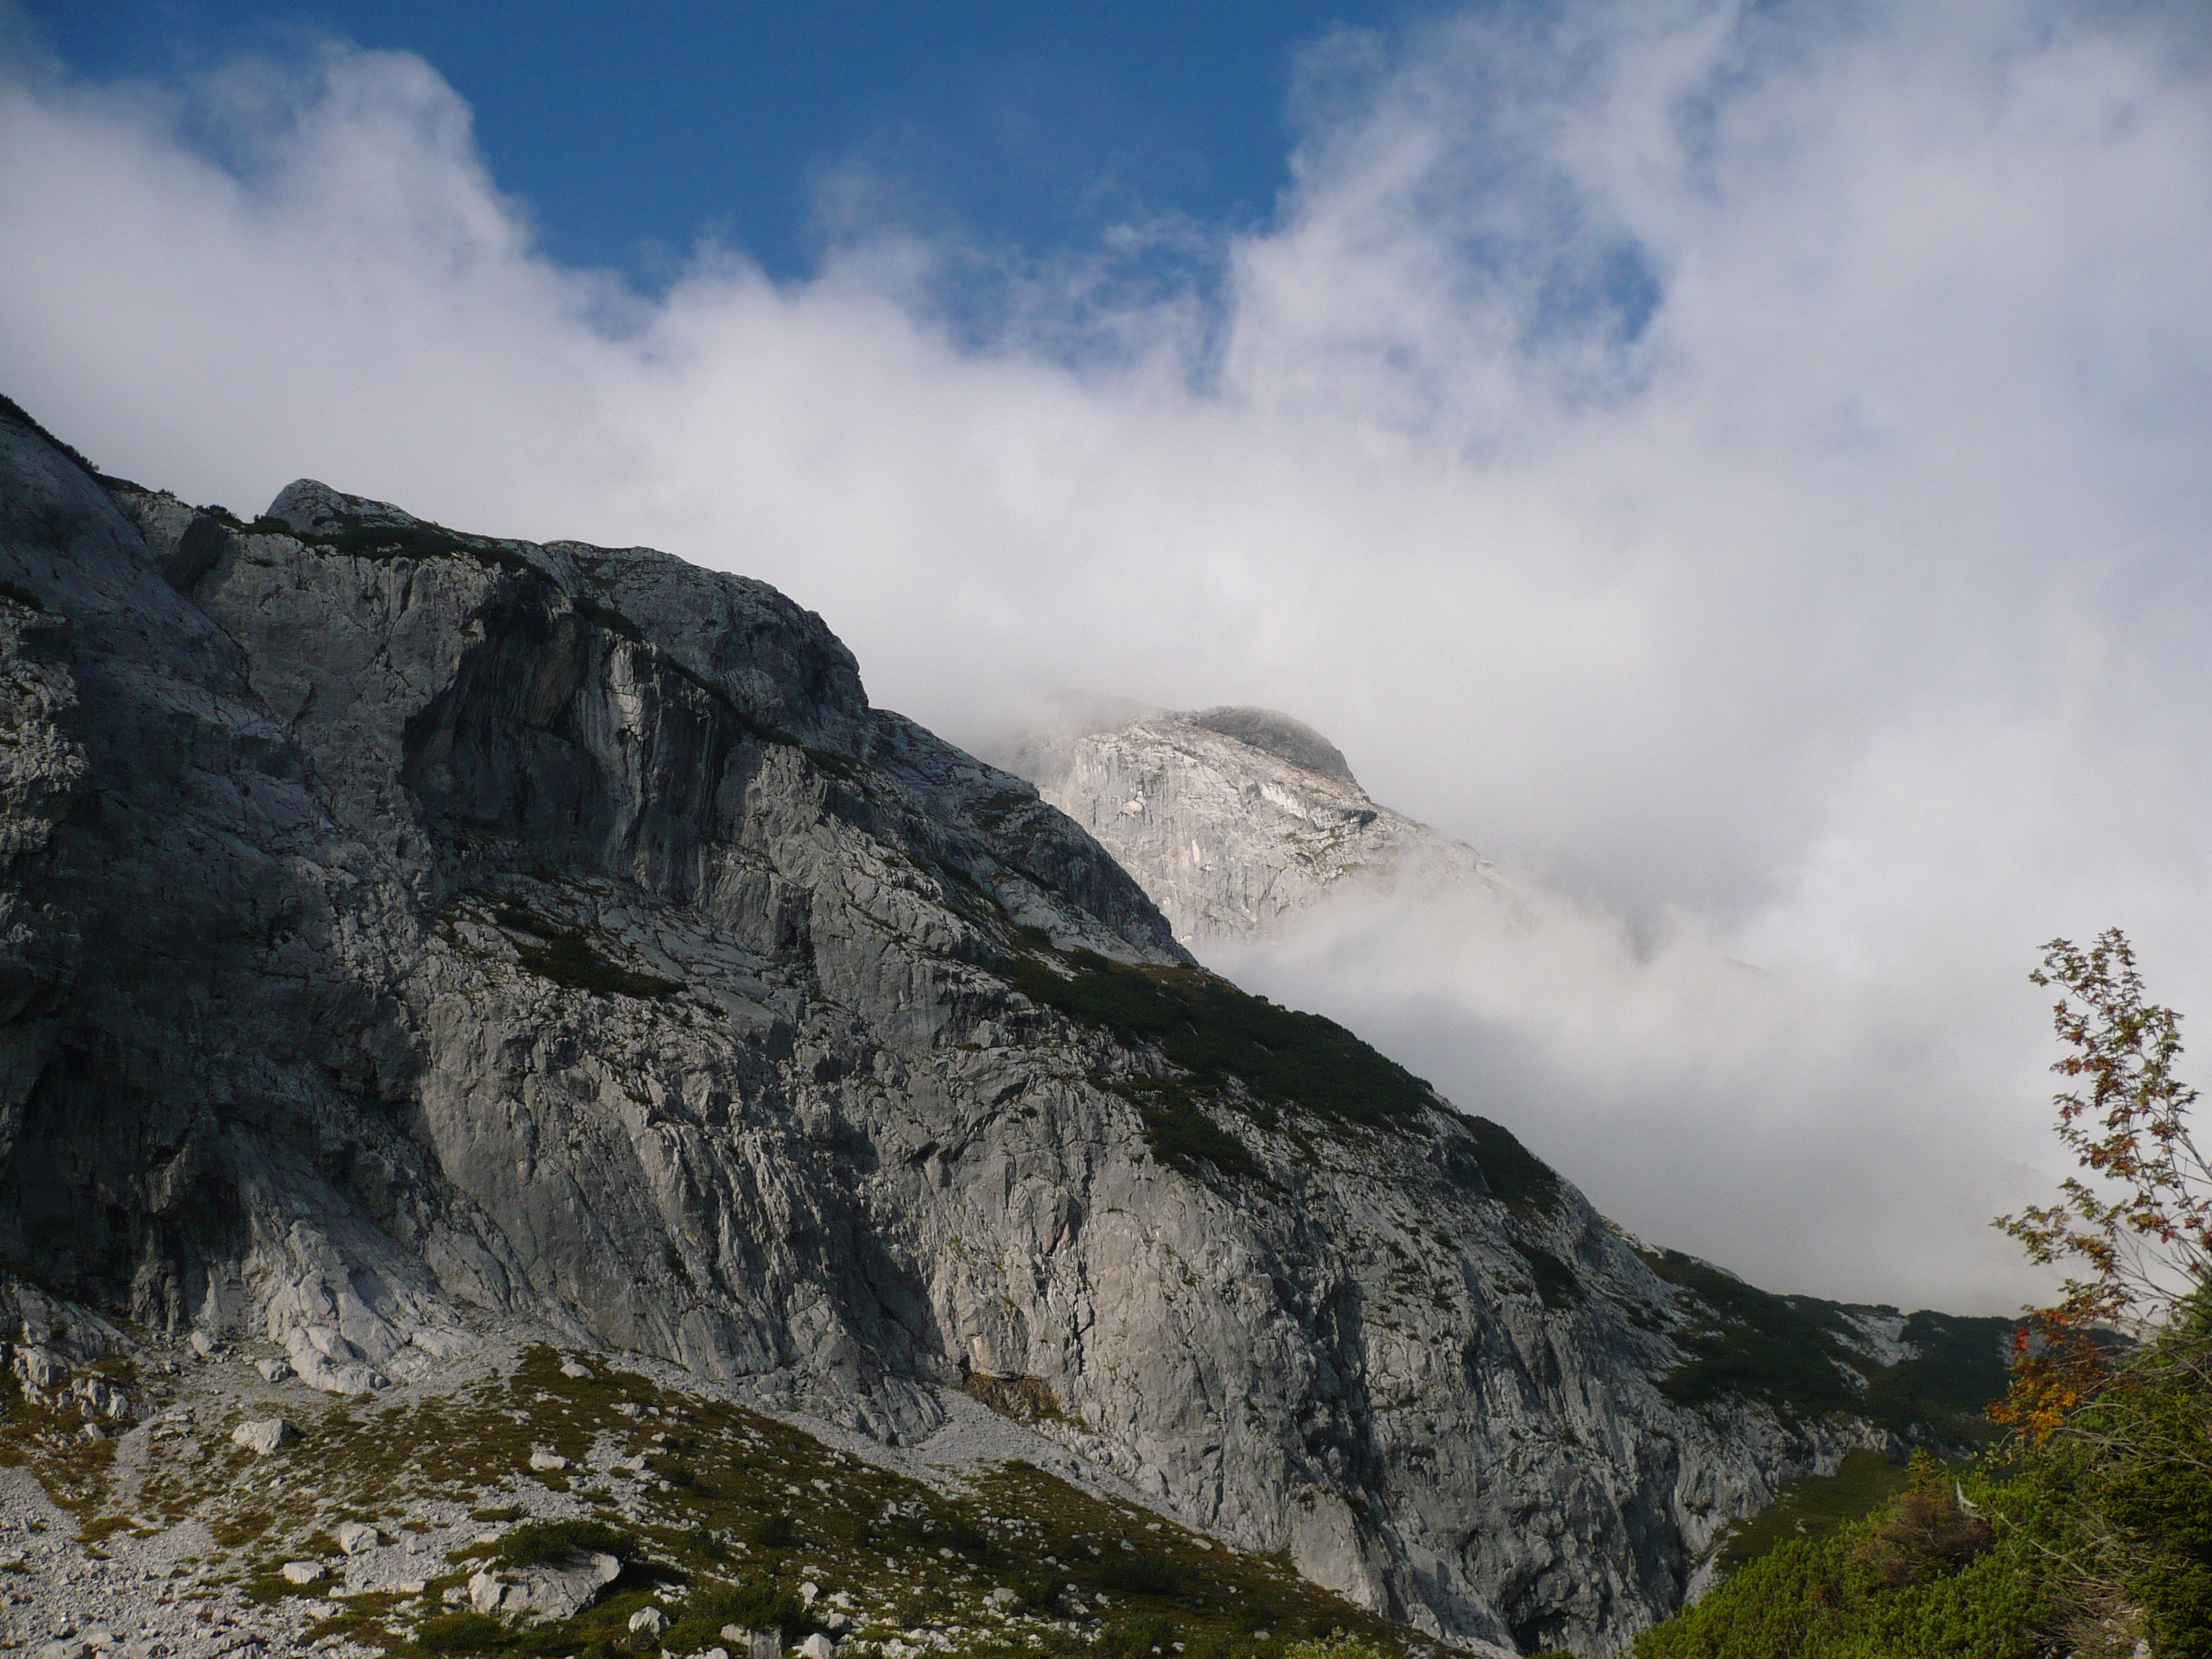 Klettersteig Montafon : Klettersteige im montafon